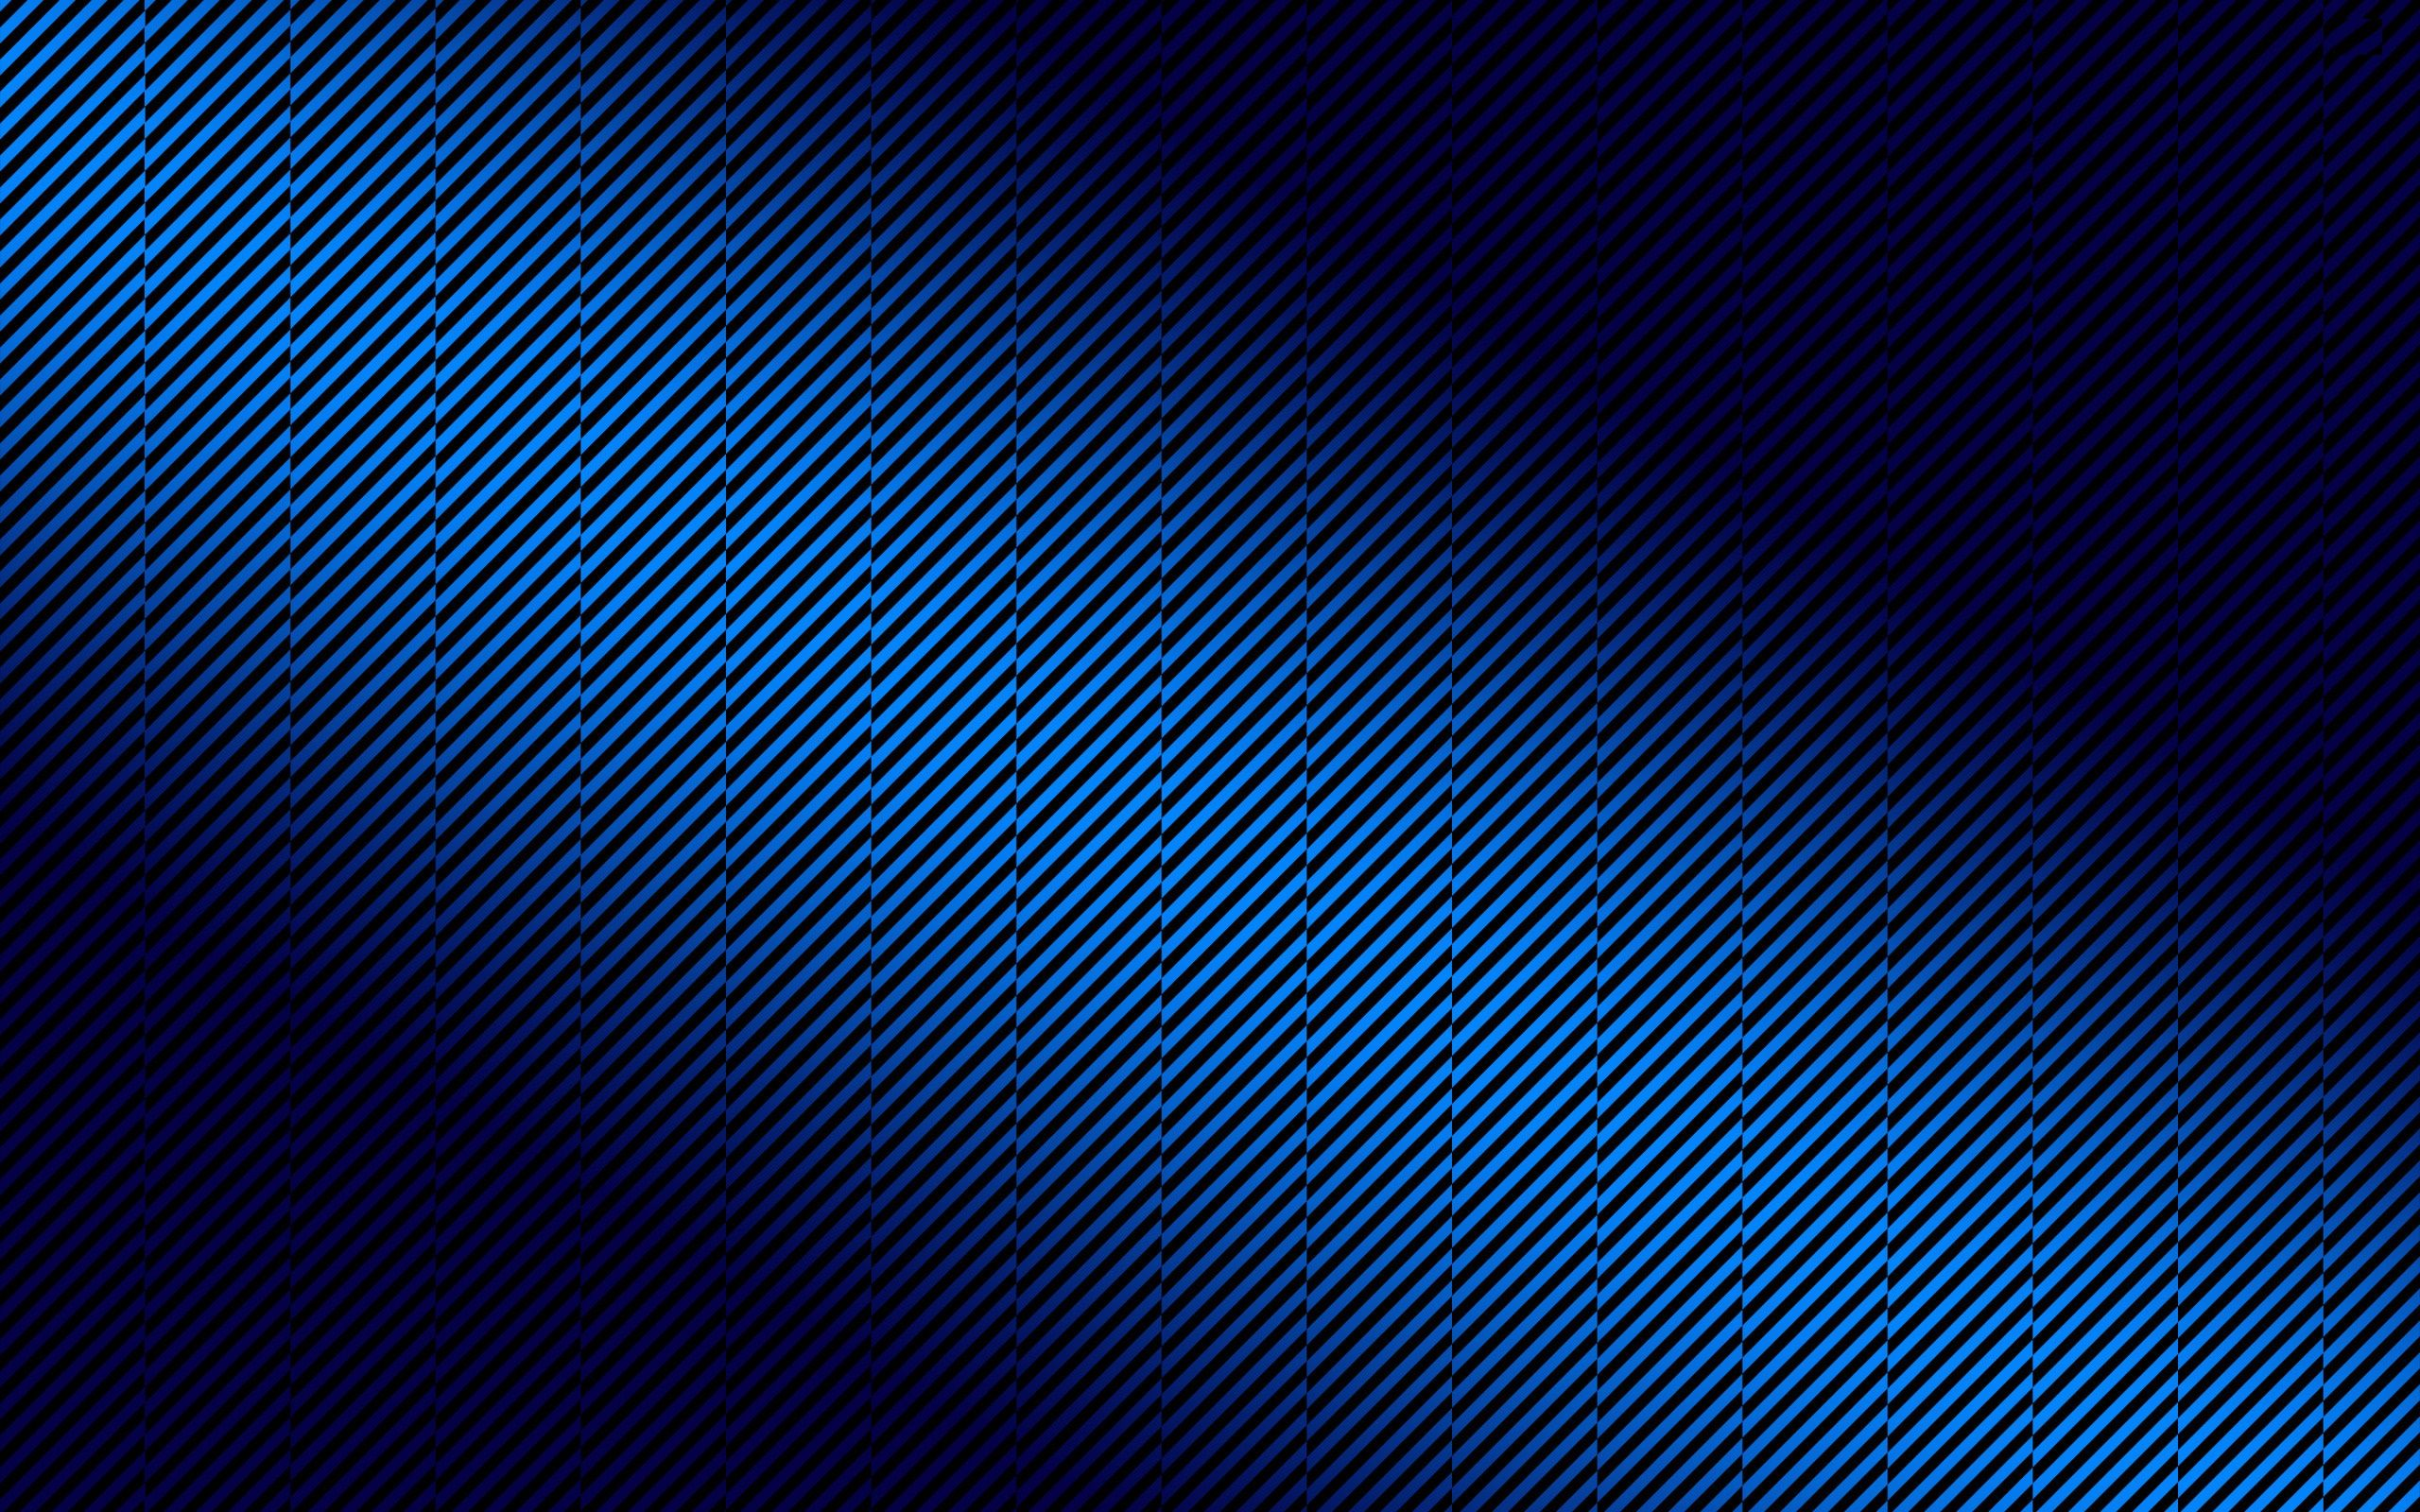 Blue Carbon Fiber Wallpapers - Top Free Blue Carbon Fiber ...